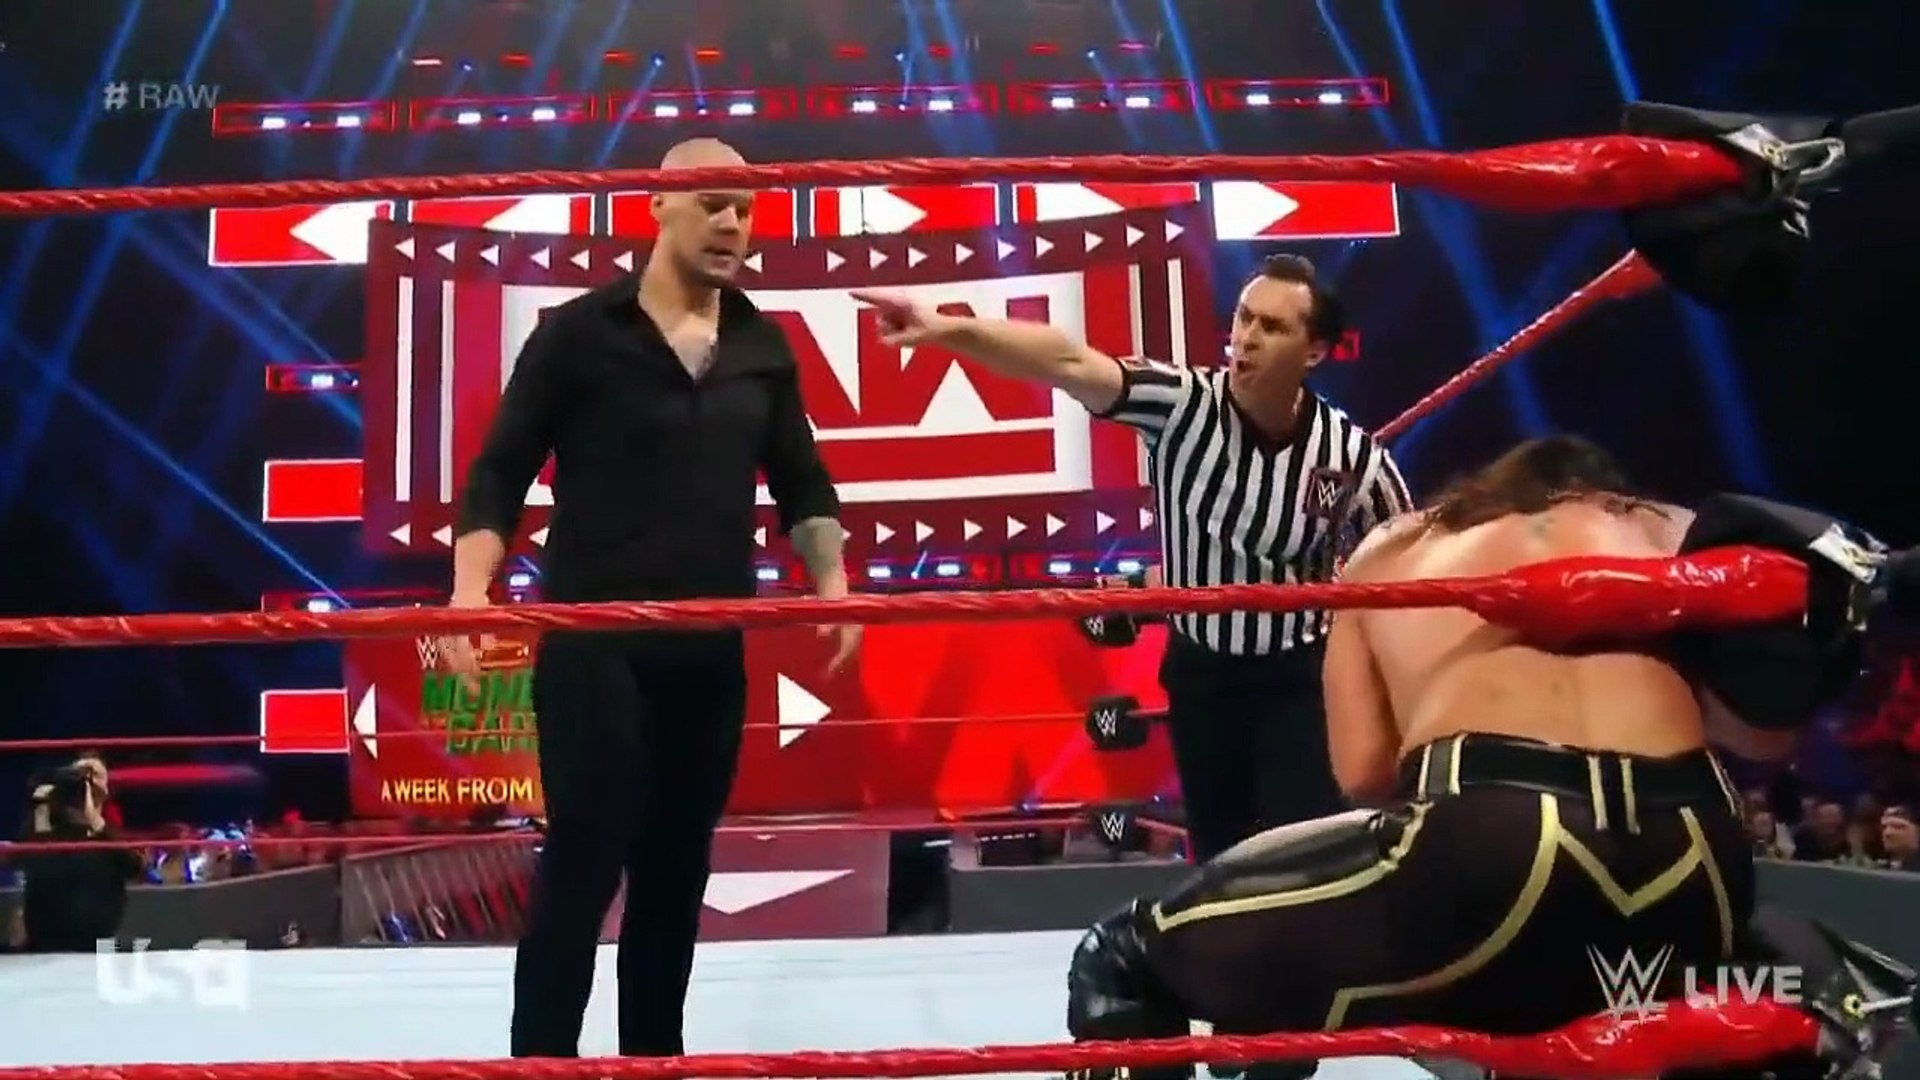 WWE Raw 05_06_2019 Highlights HD - WWE Raw 6th May 2019 Highlights HD